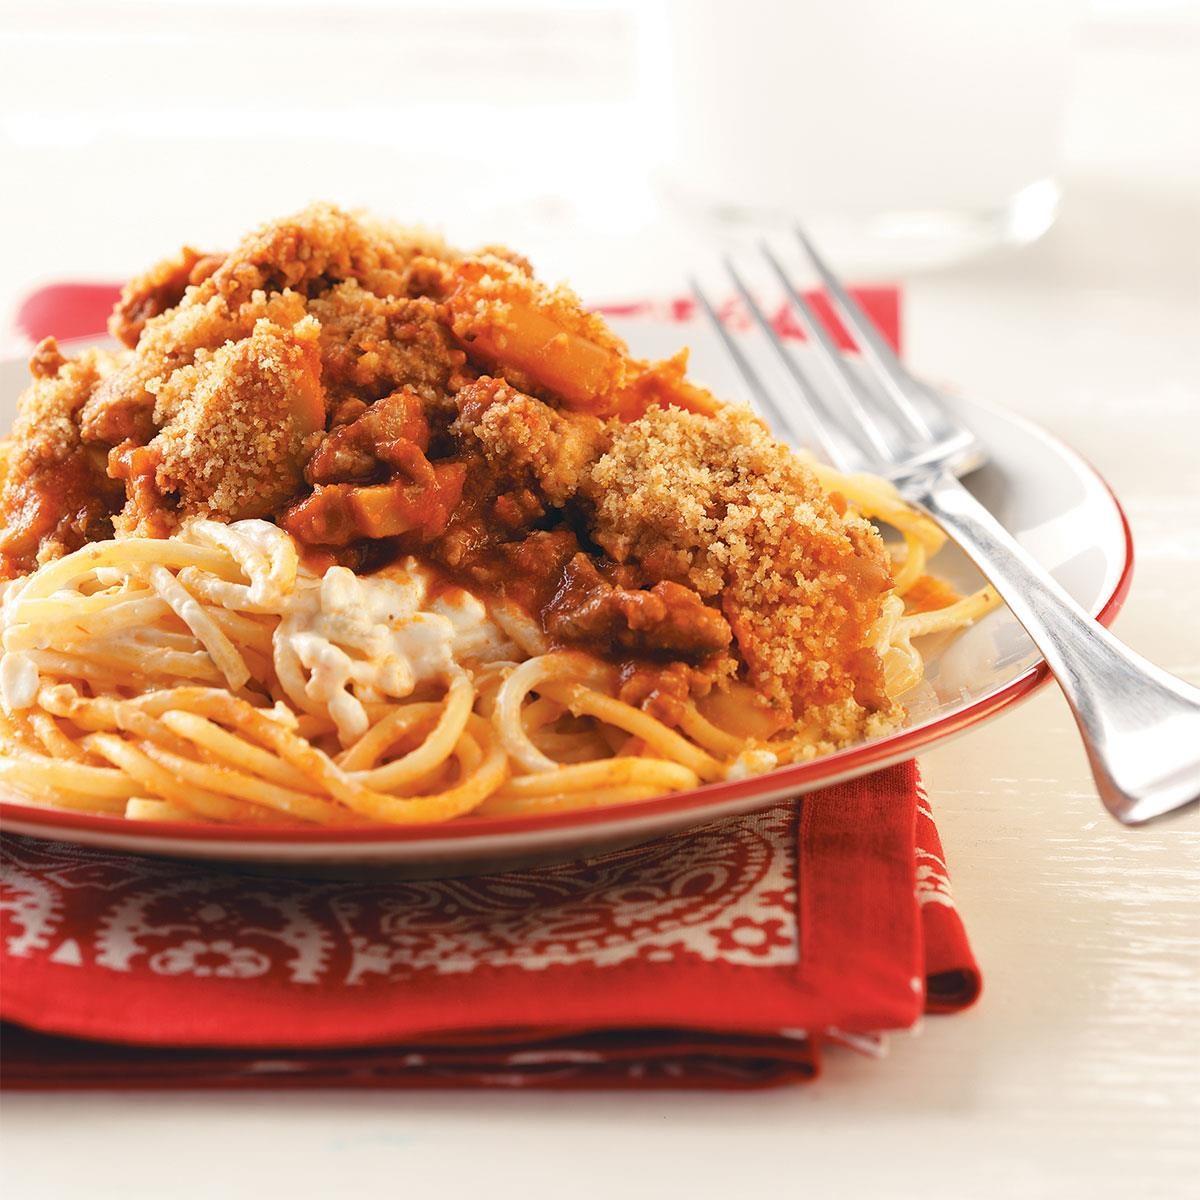 Potluck Baked Spaghetti